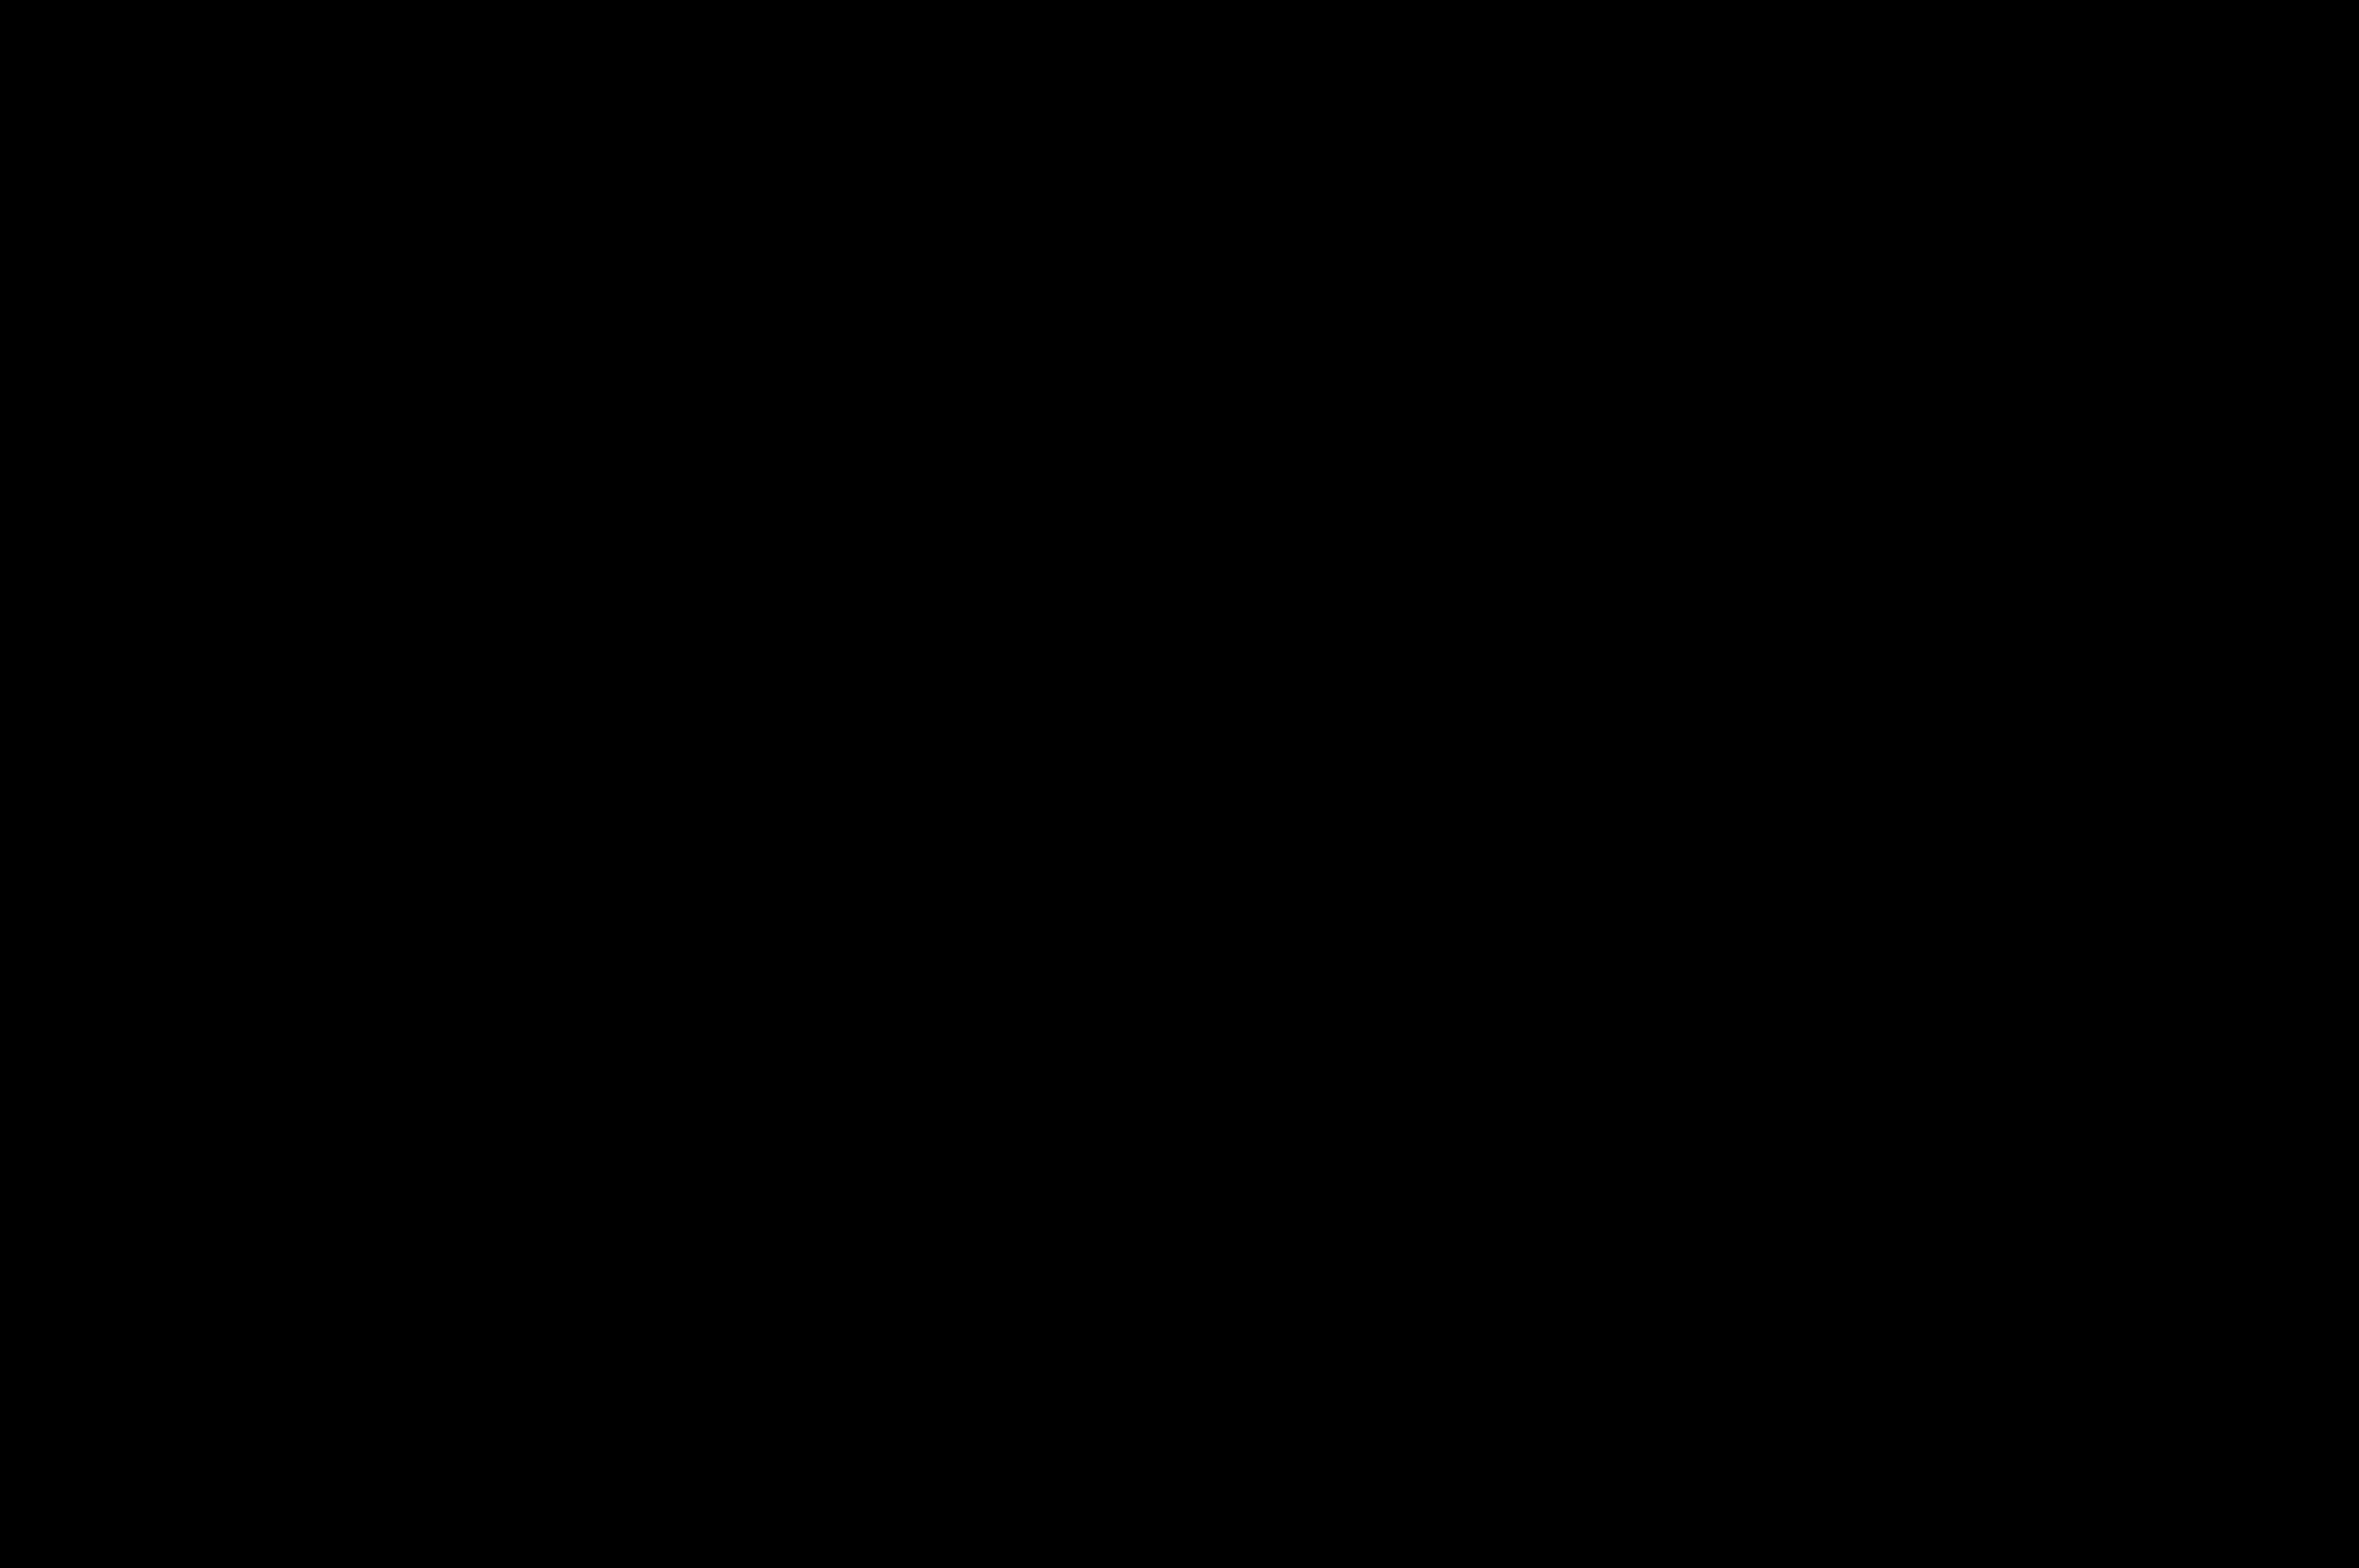 dsc_1331-scaled